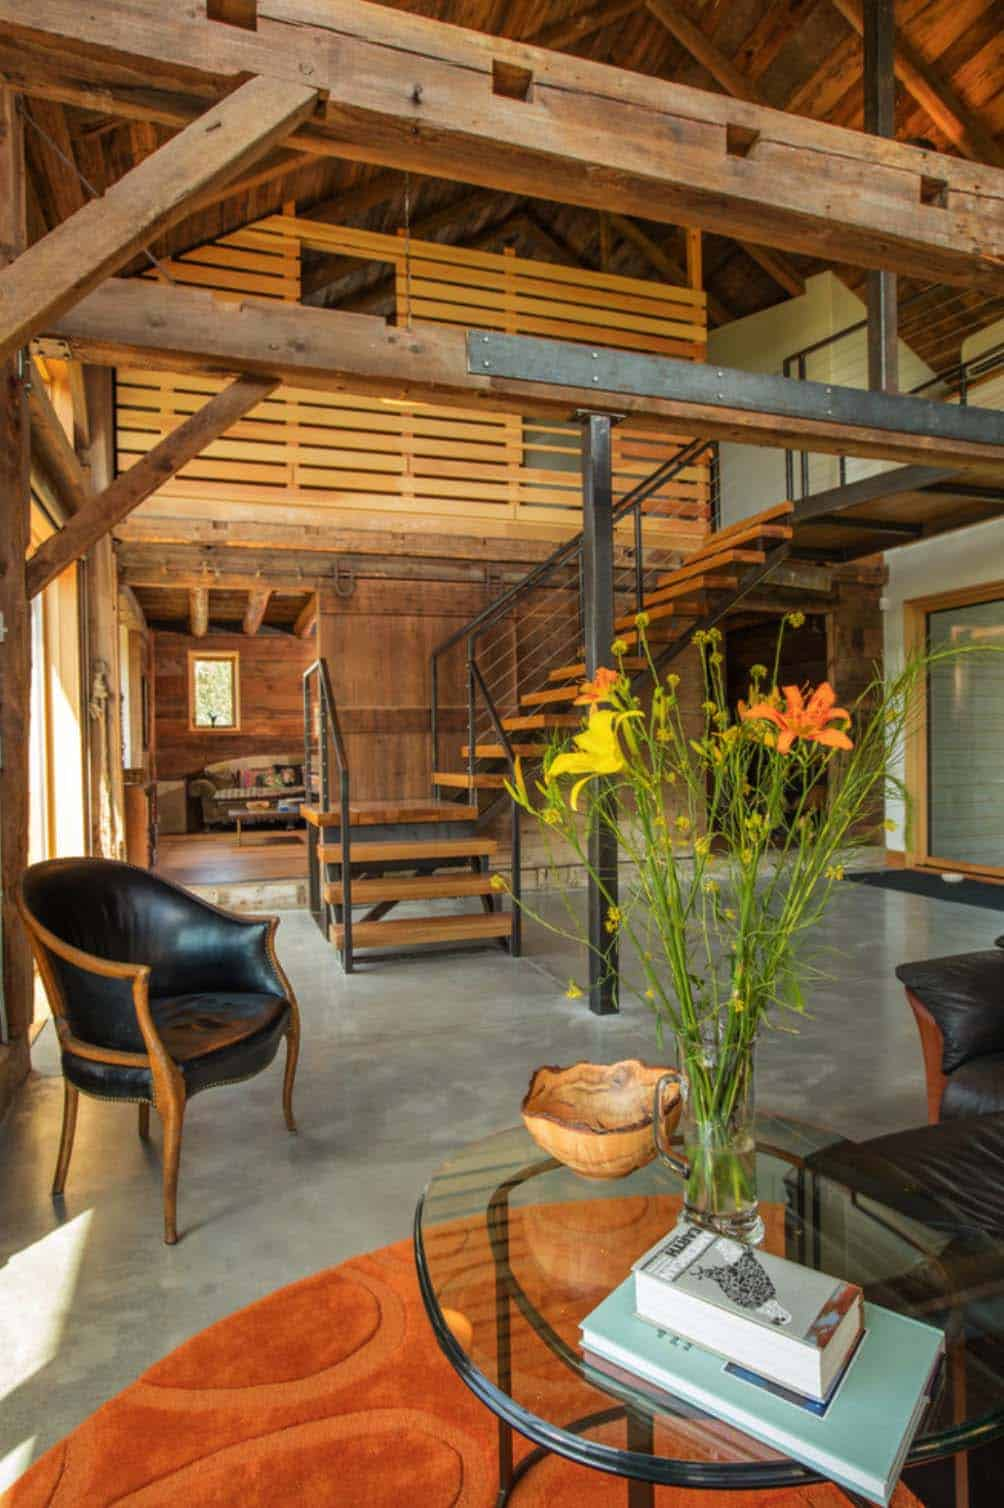 Rustic Barn Guesthouse-Joan Heaton Architects-12-1 Kindesign